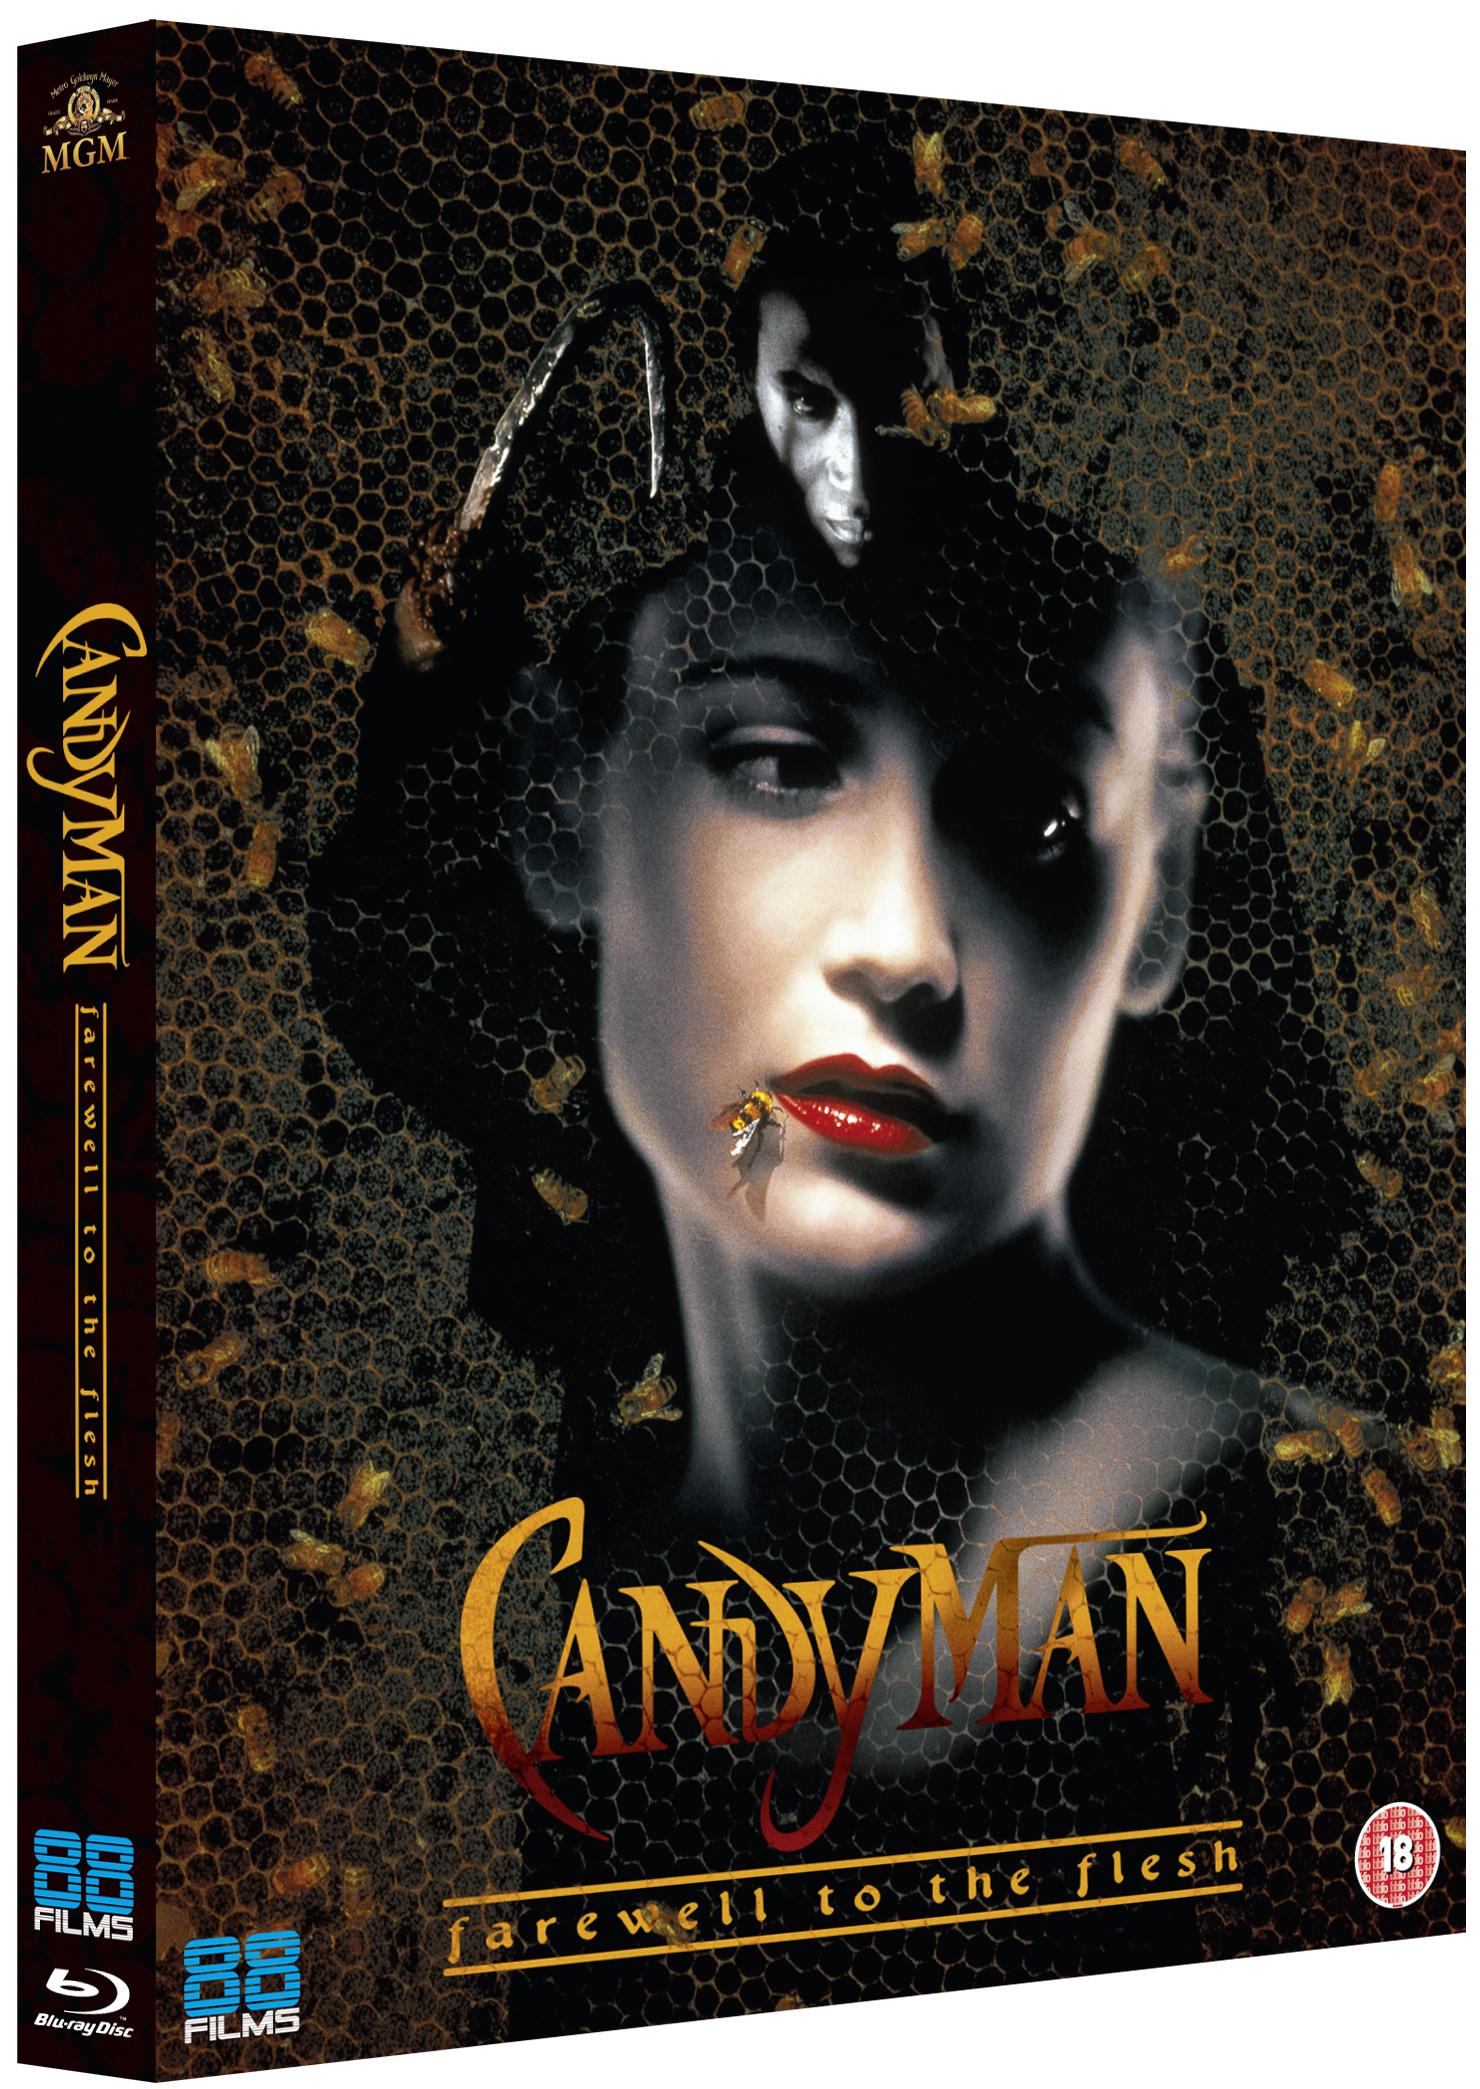 Candyman Farewell to the Flesh - packshot (88 Films).jpg